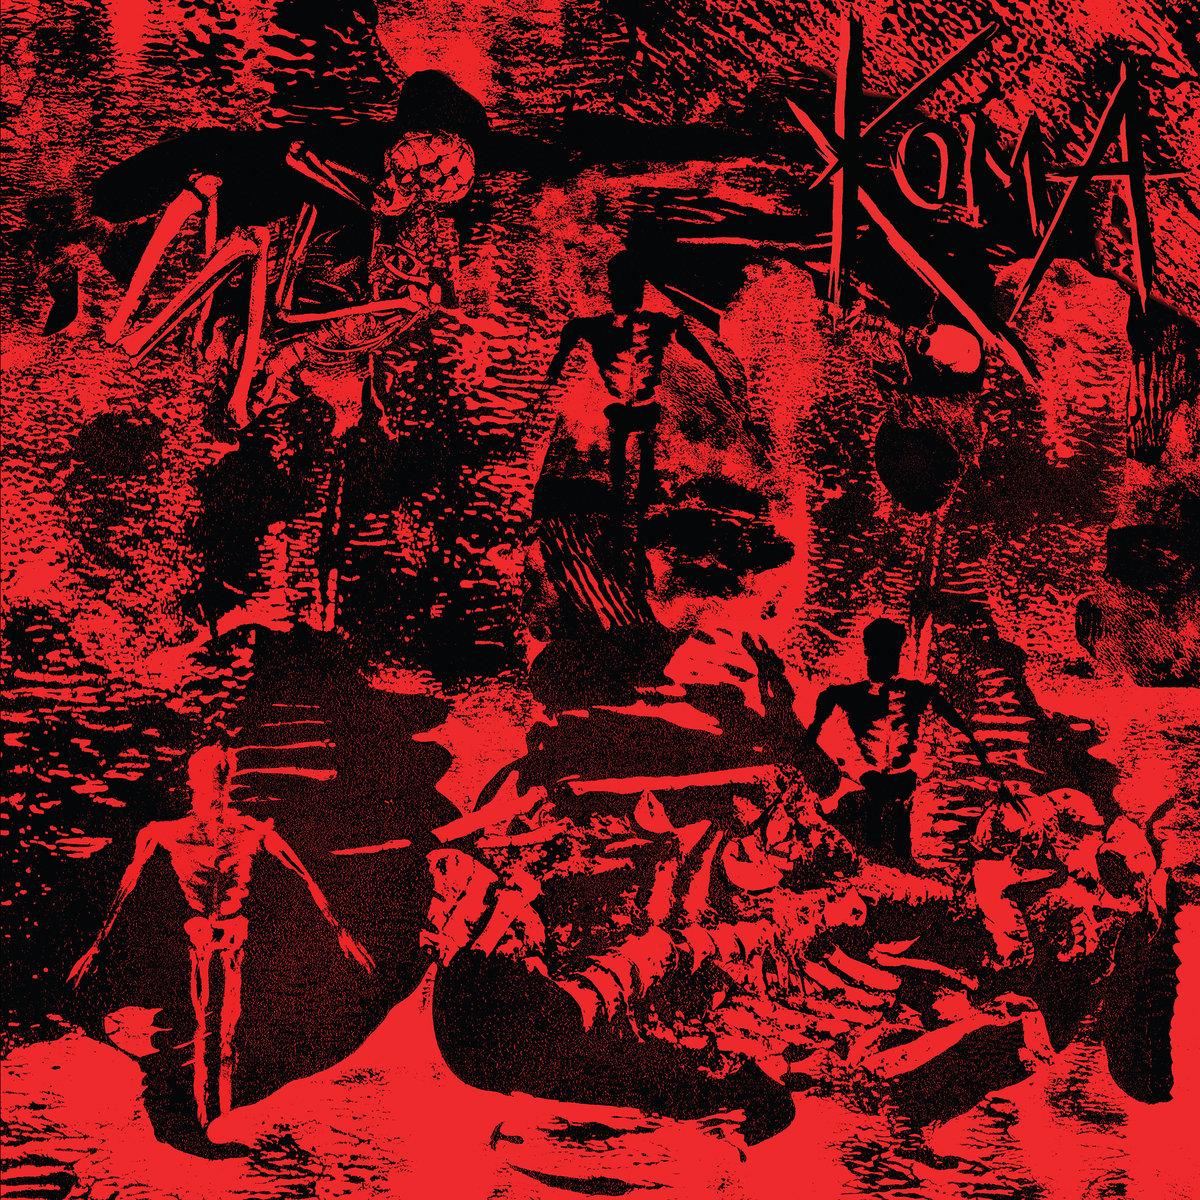 Stream Koma's Exhilarating Noise-Shredded Hardcore Debut Internment Failure